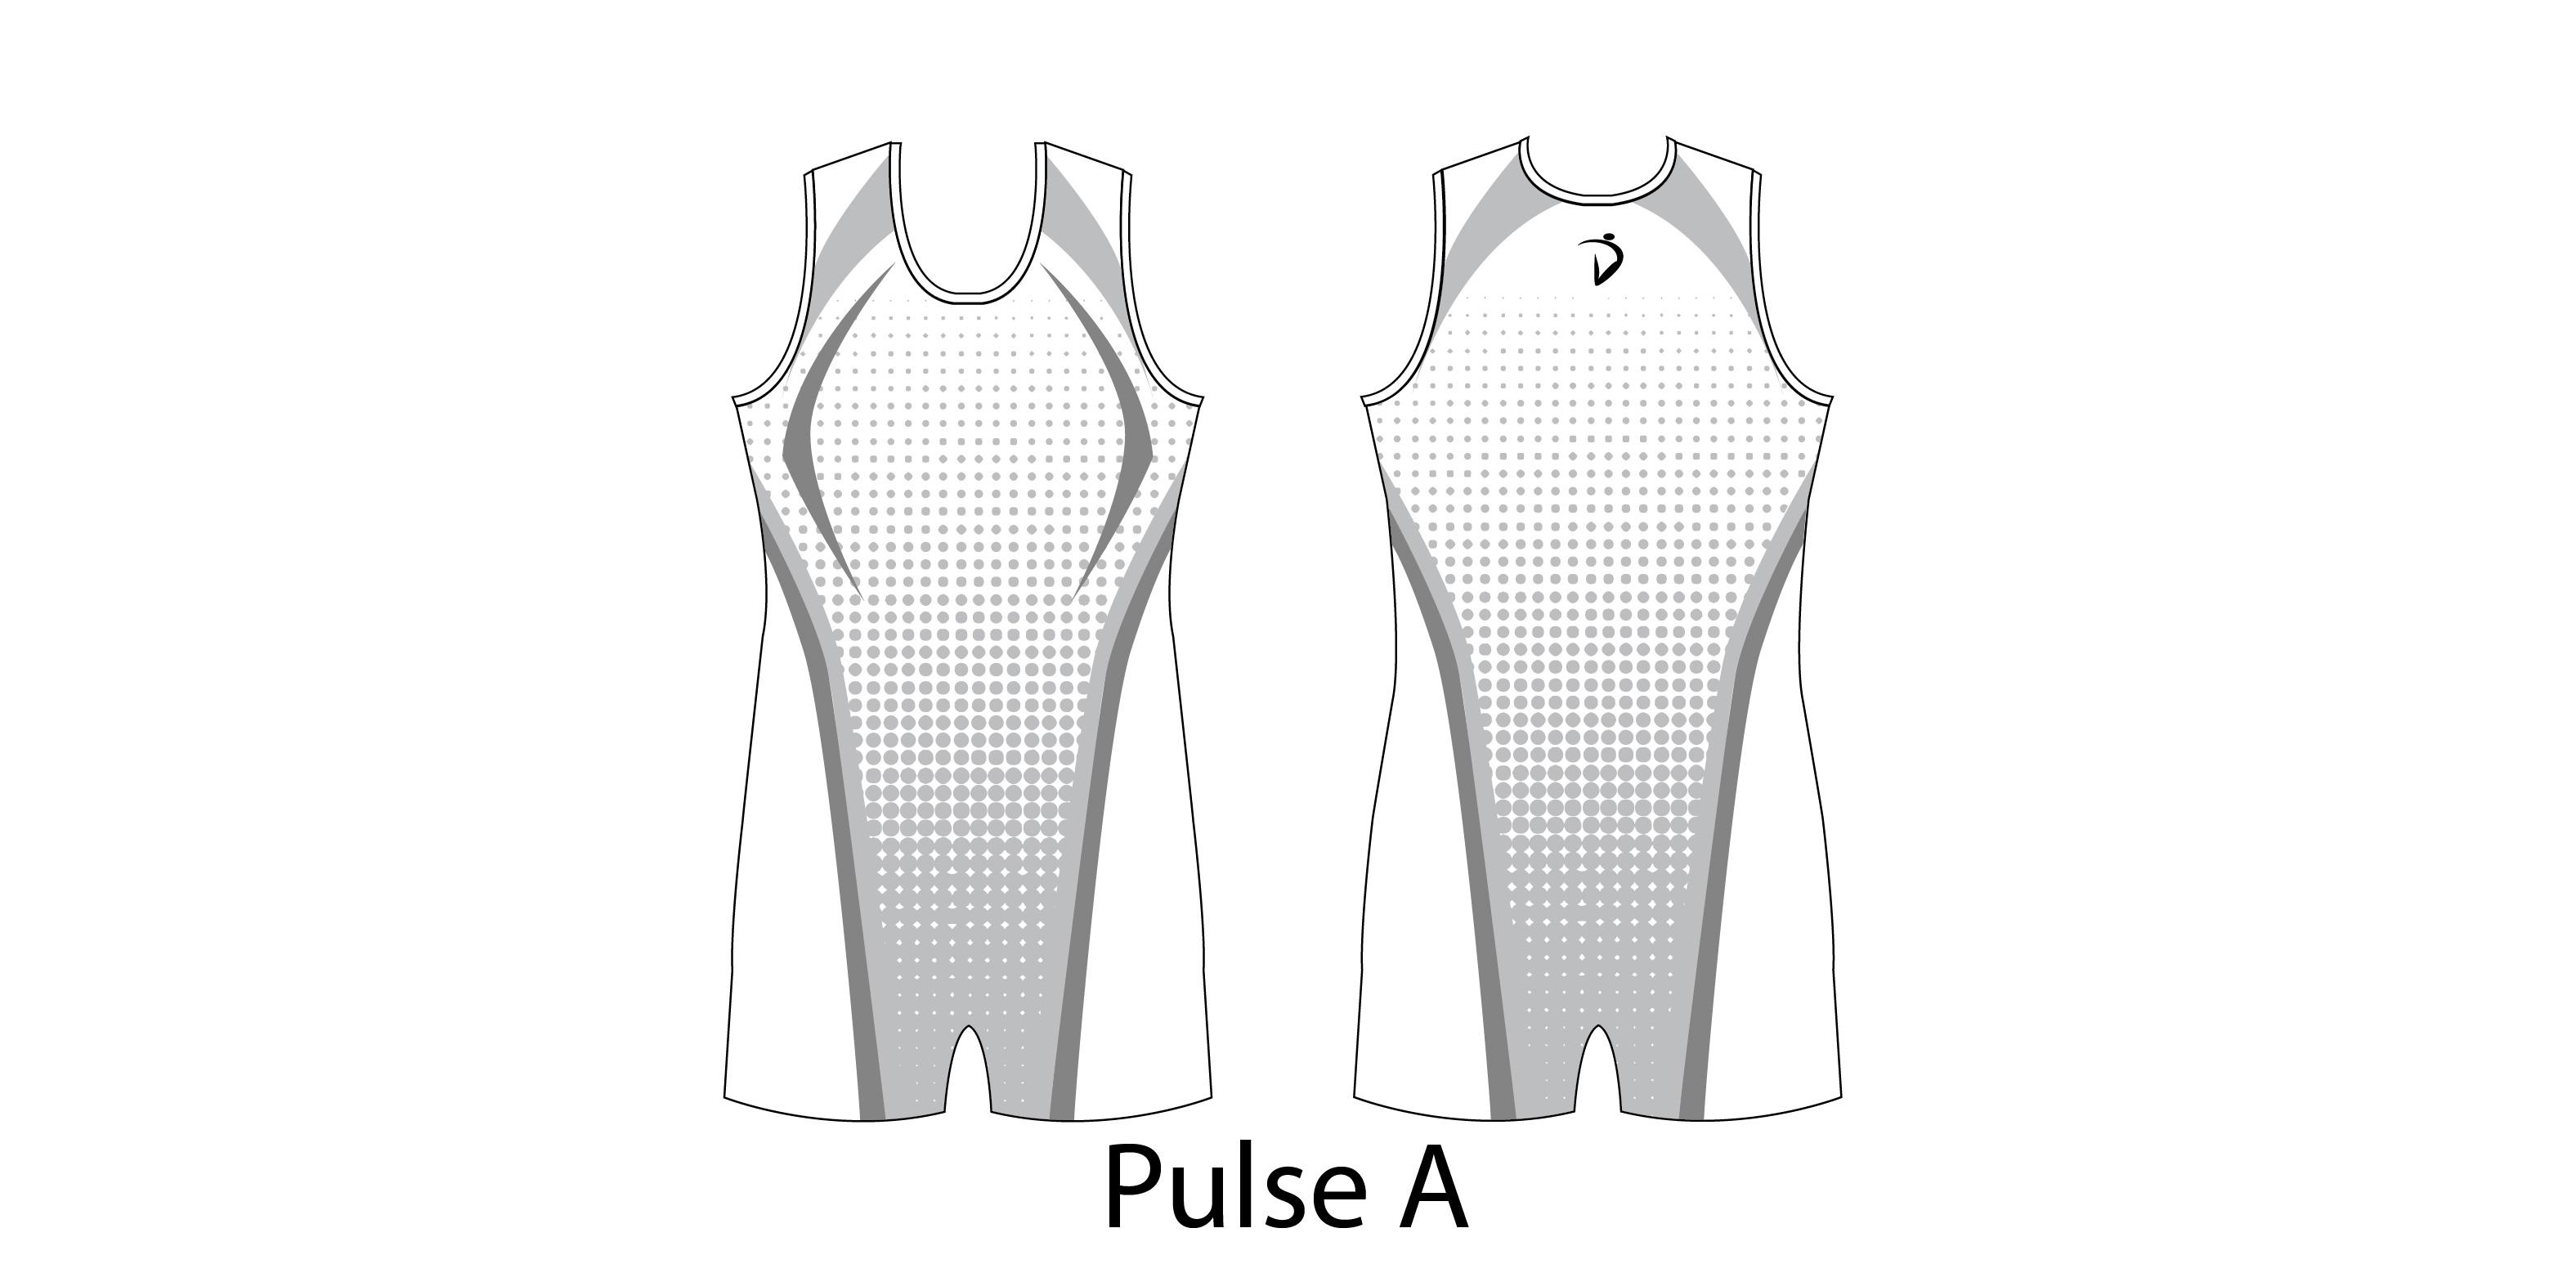 Pulse A